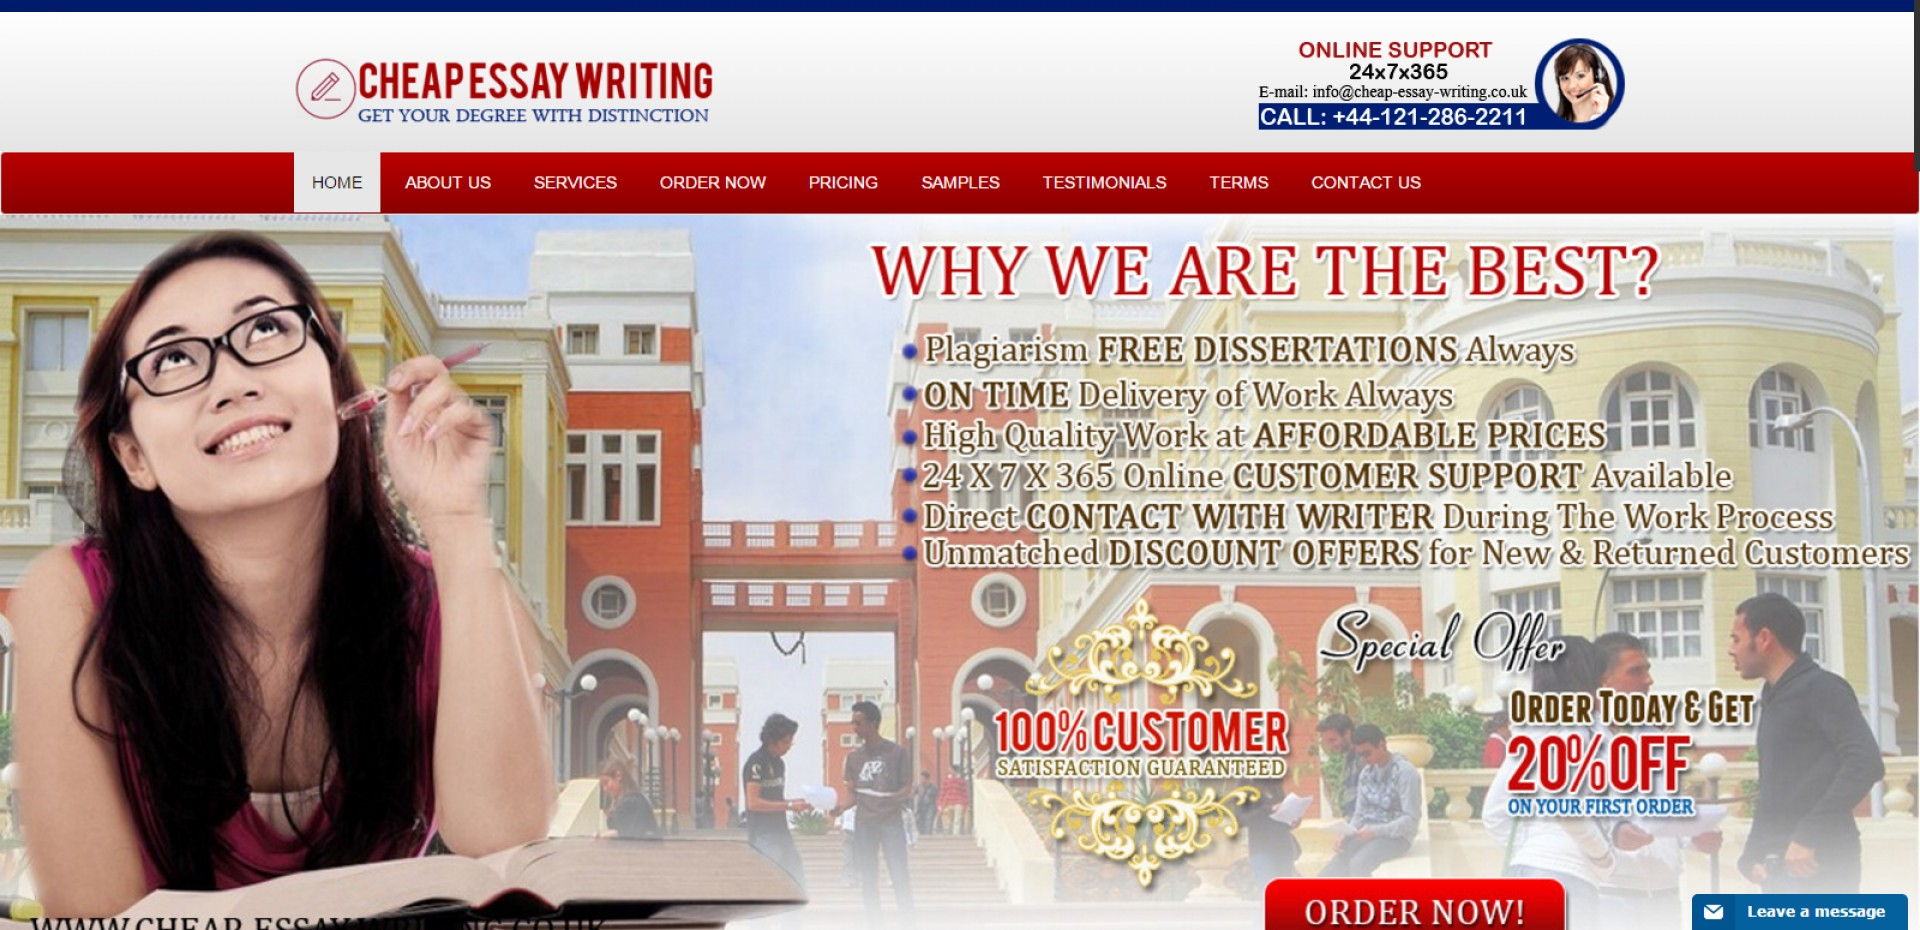 010 Cheap Essay Writing Services Uk Custom Service Impressive Are Legal Australia 1920